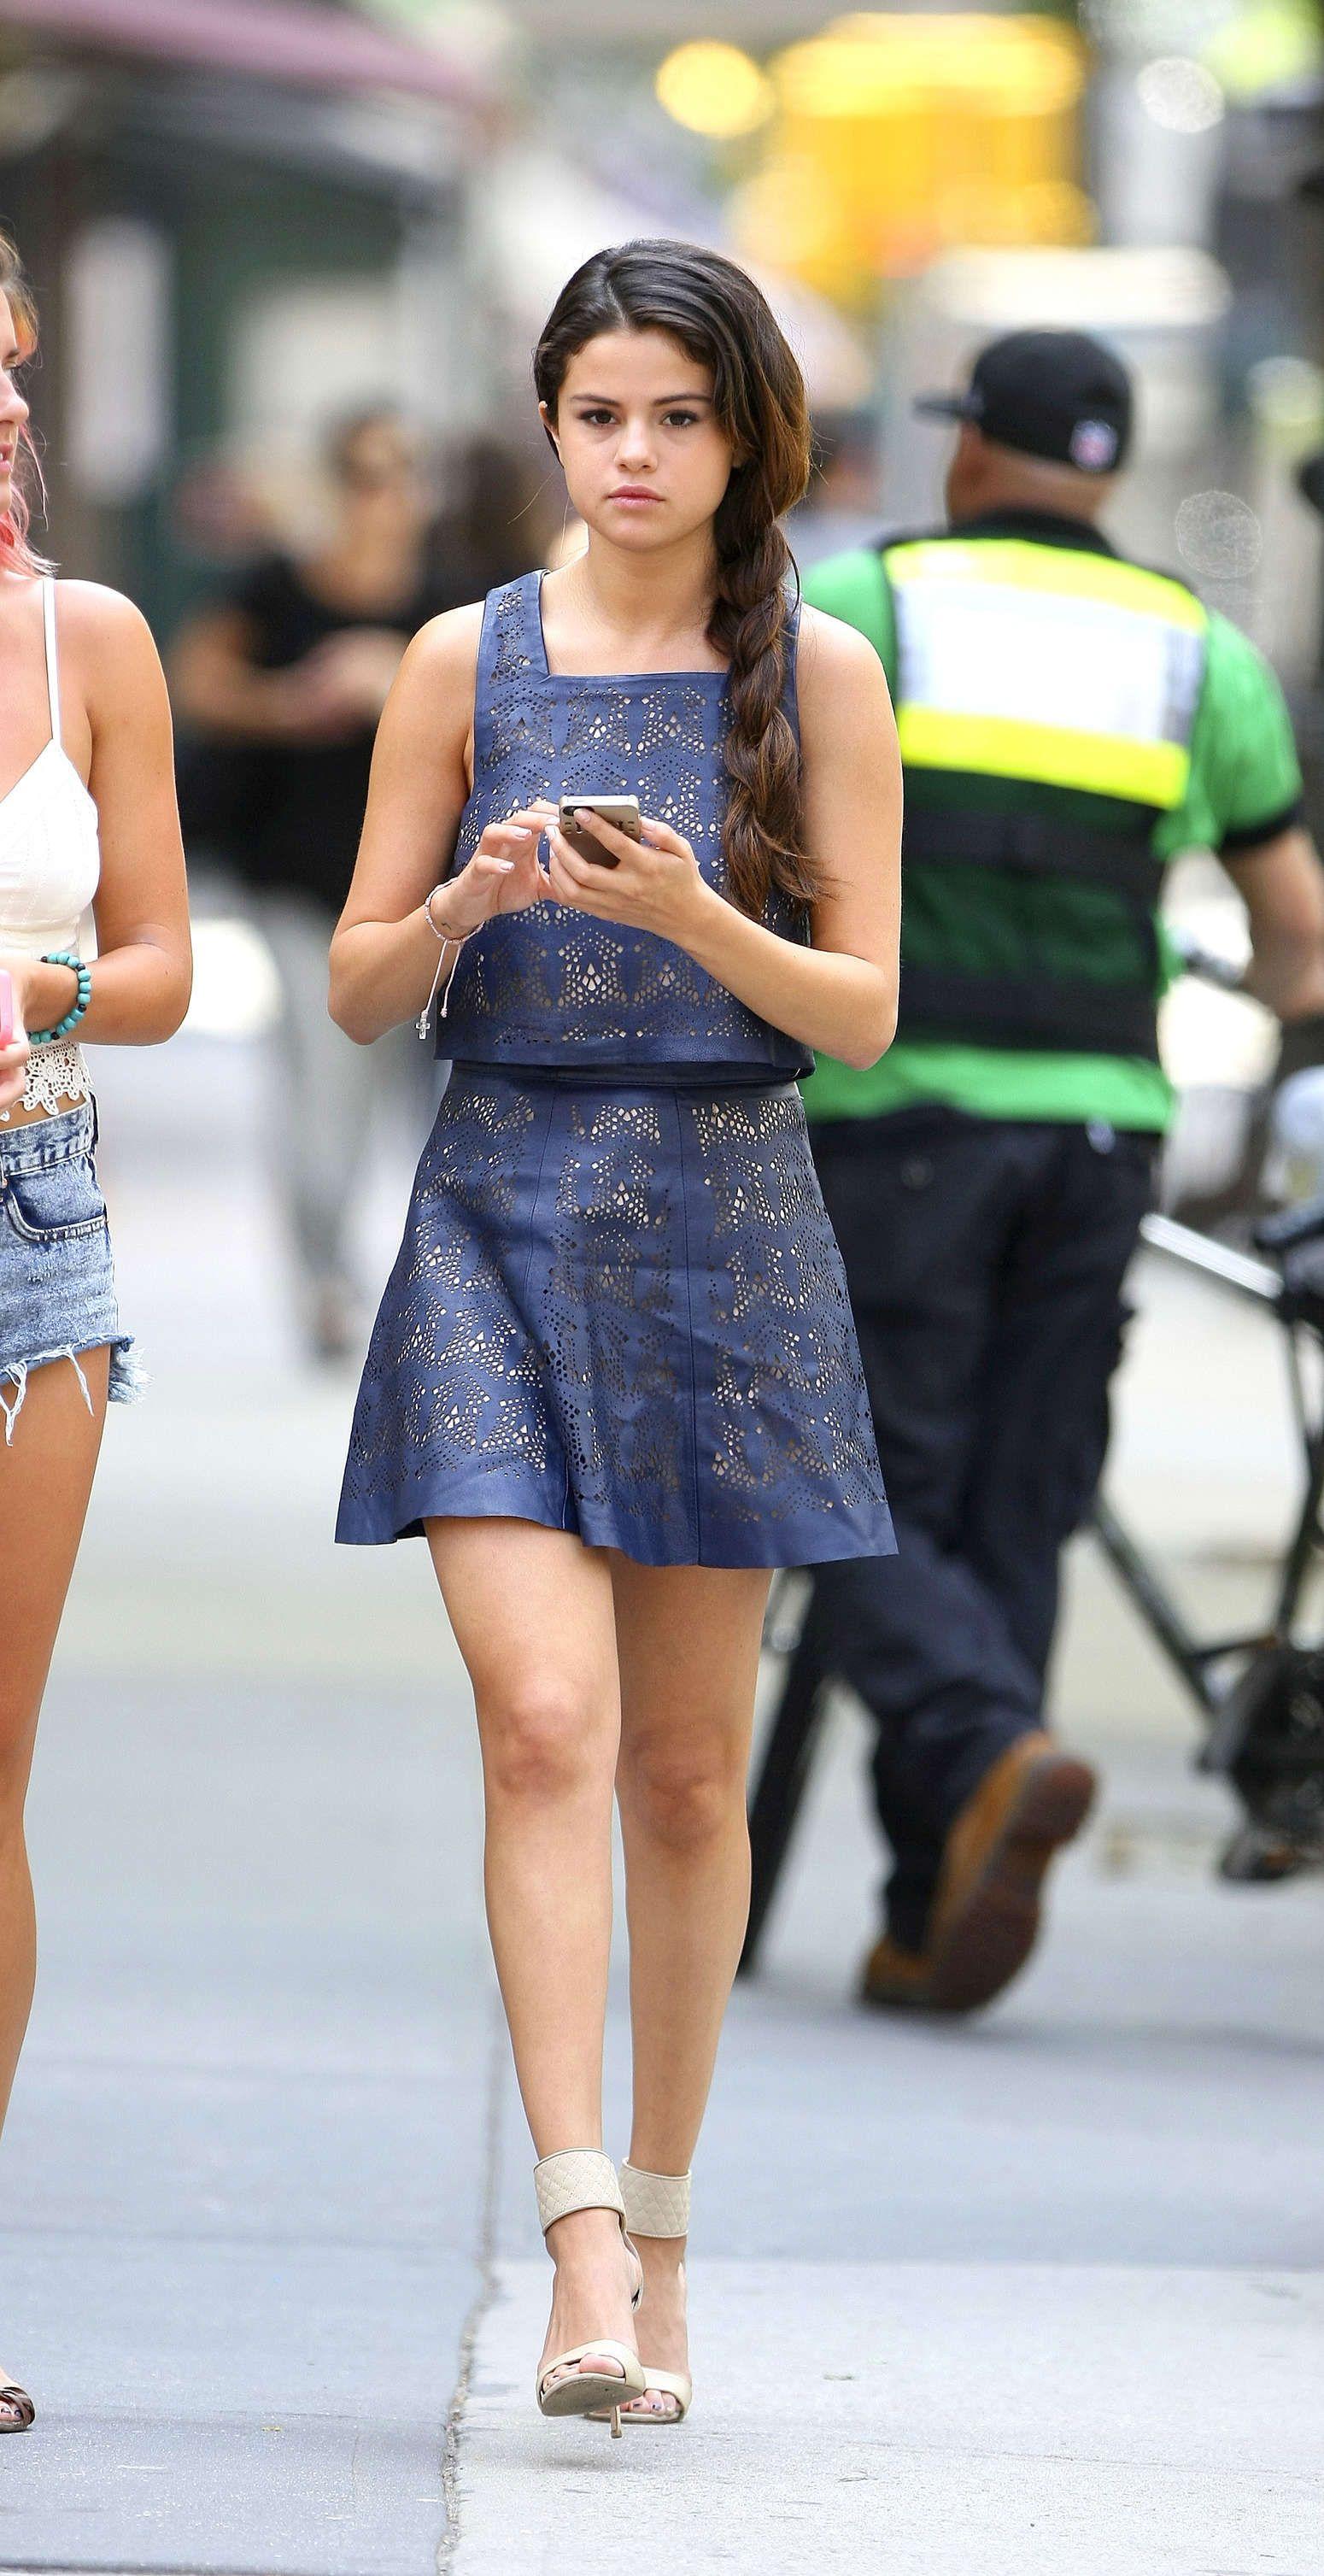 Selena Gomez Legs Show X3015